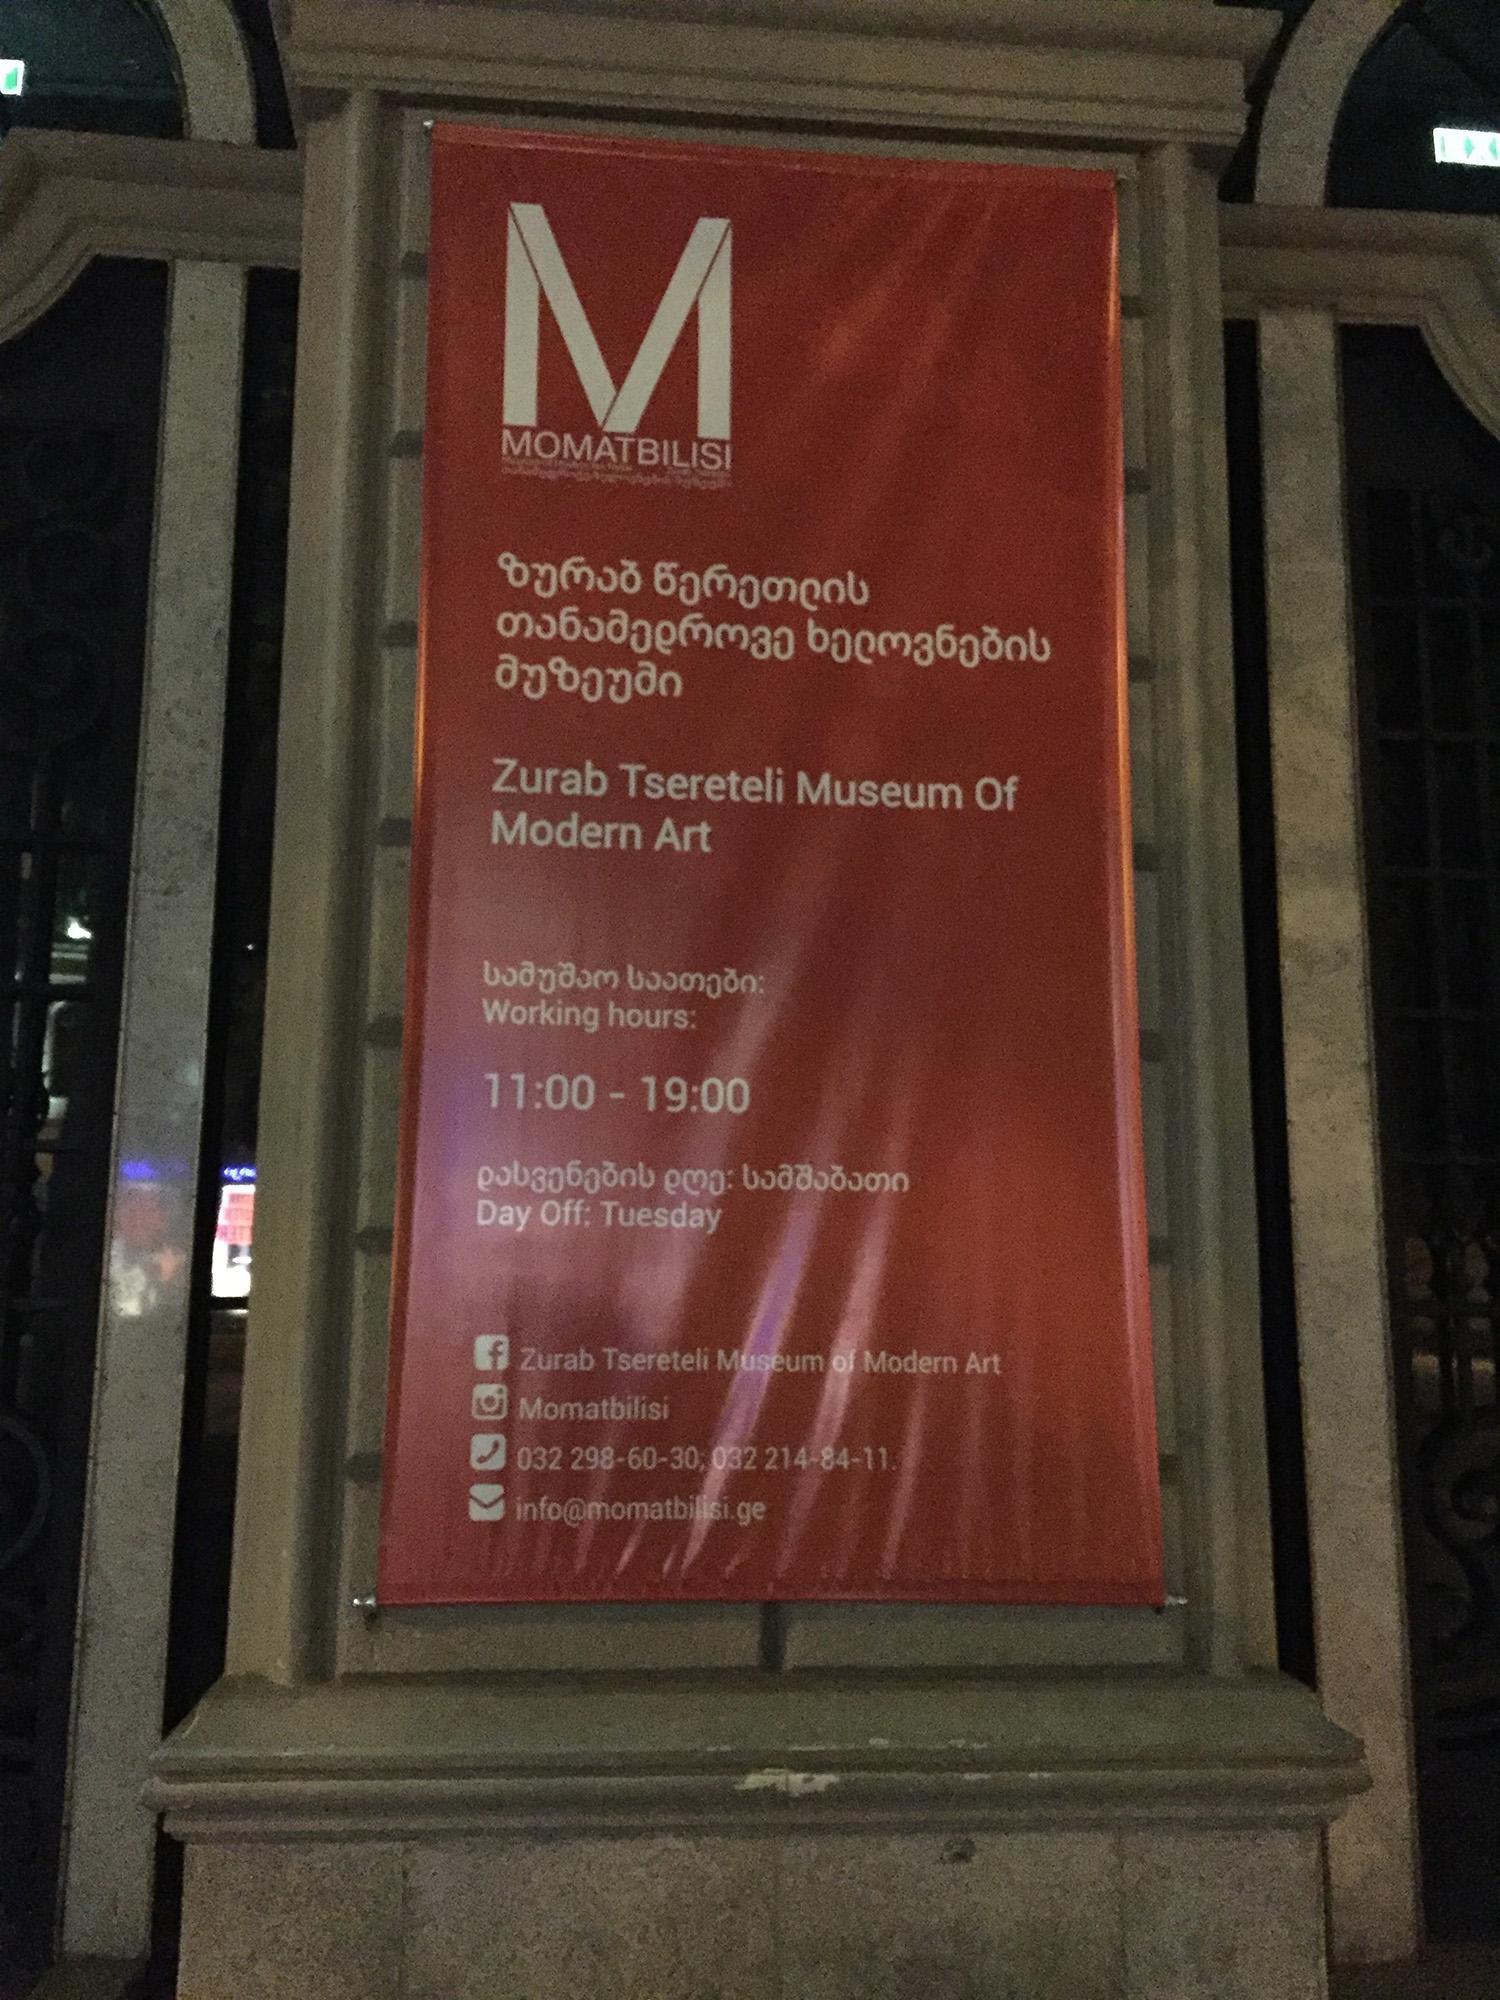 Tsereteli MoMA, Tblisi, Republic of Georgia